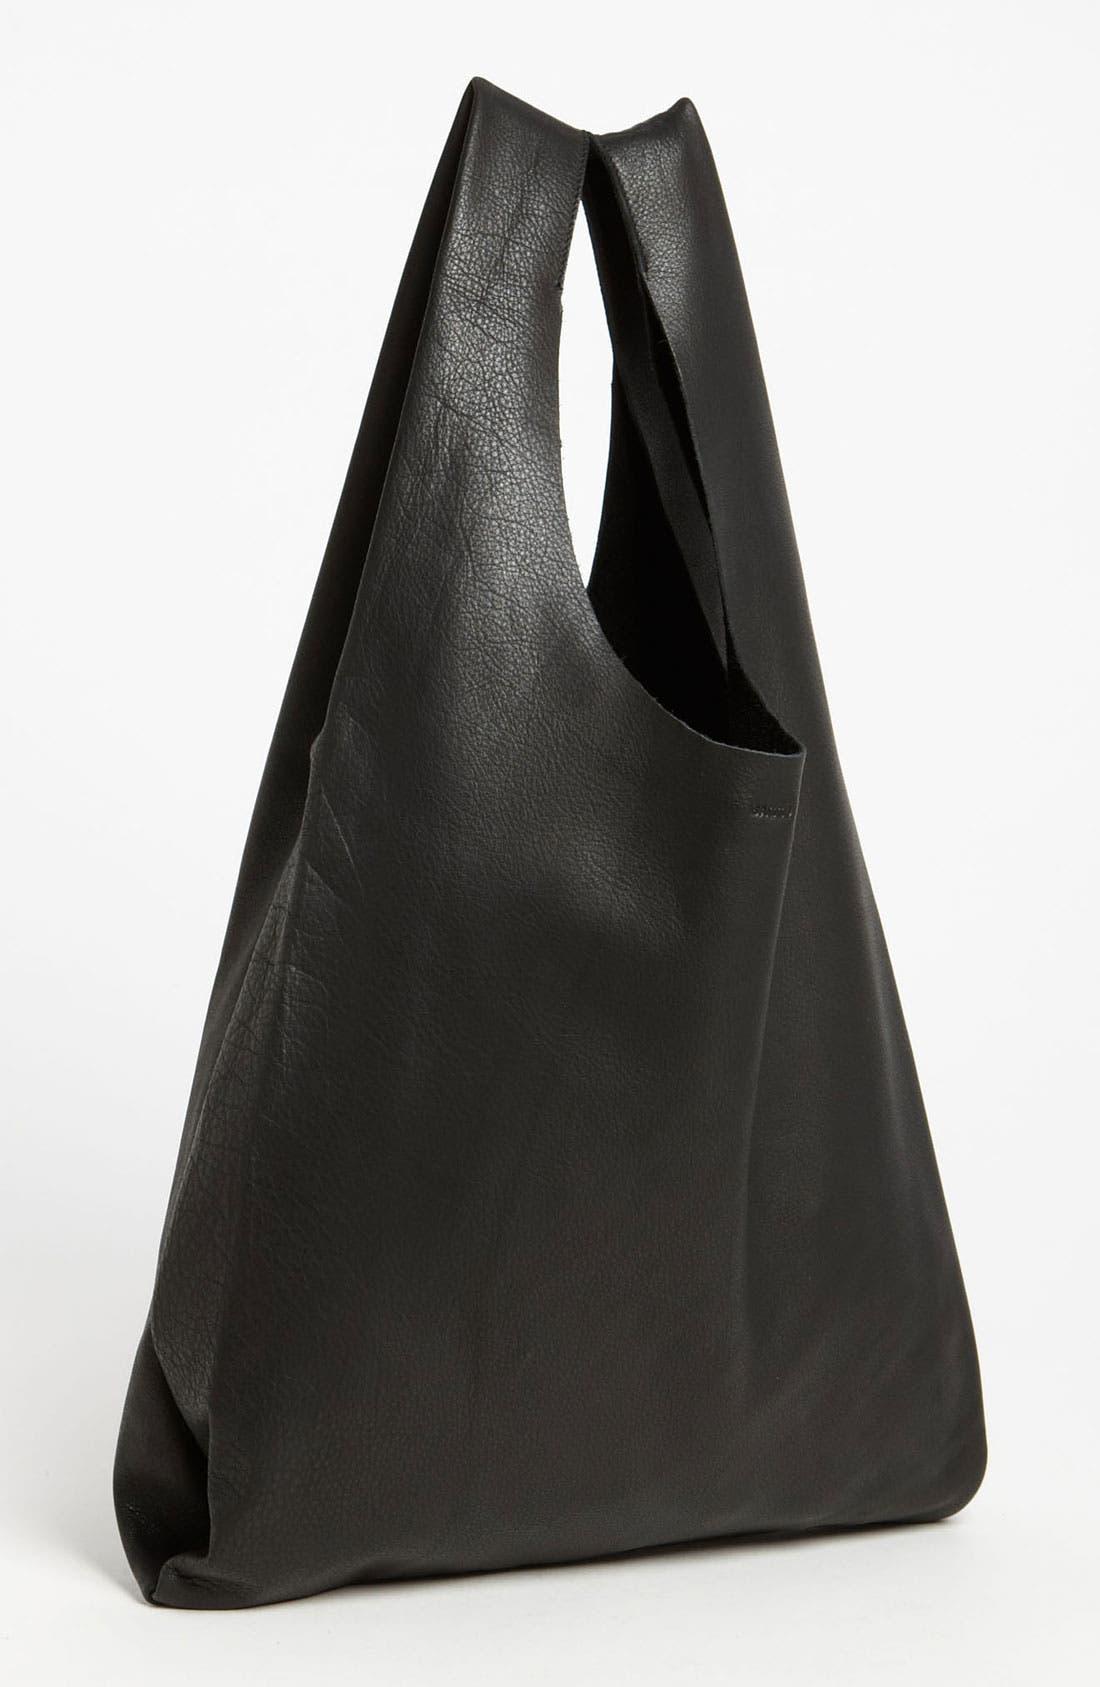 Alternate Image 1 Selected - Baggu® 'Medium' Leather Shoulder Bag